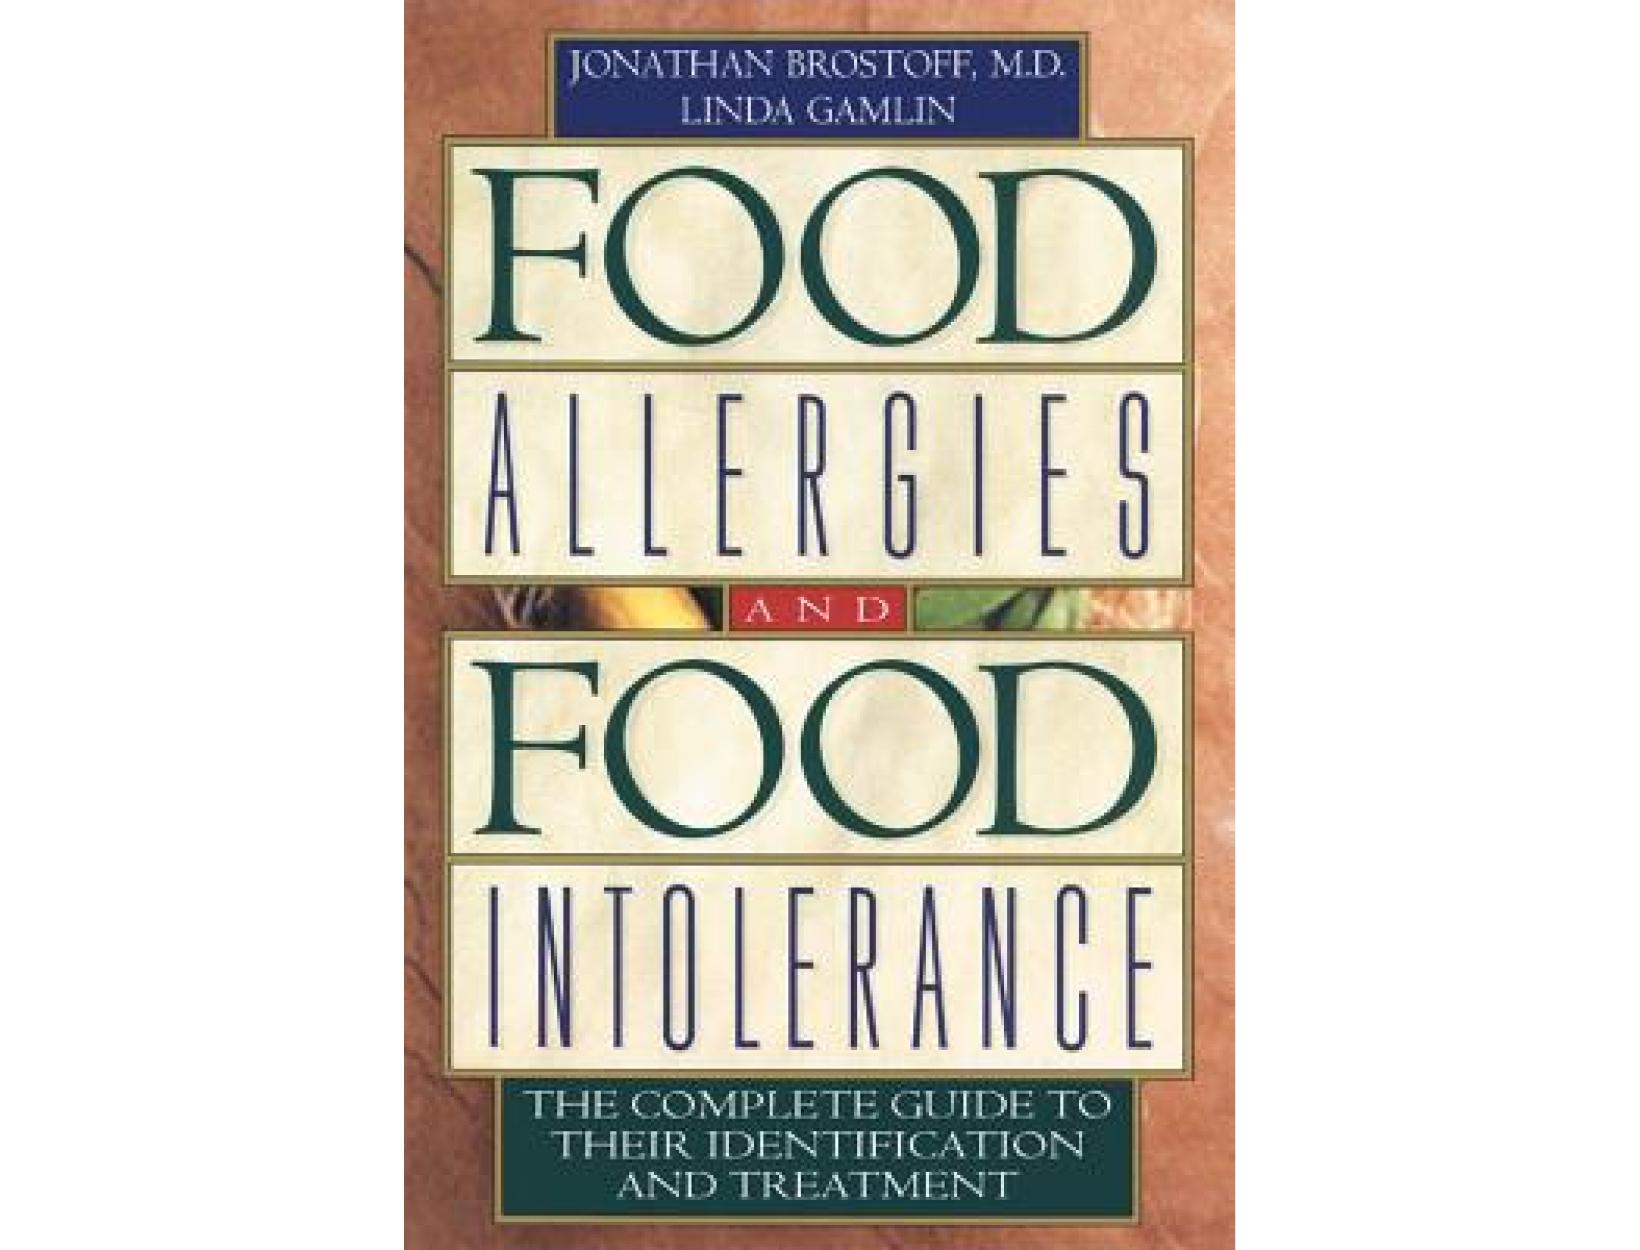 <em>Food Allergies and Food Intolerances</em> by Linda Gamlin and Jonathan Brostoff